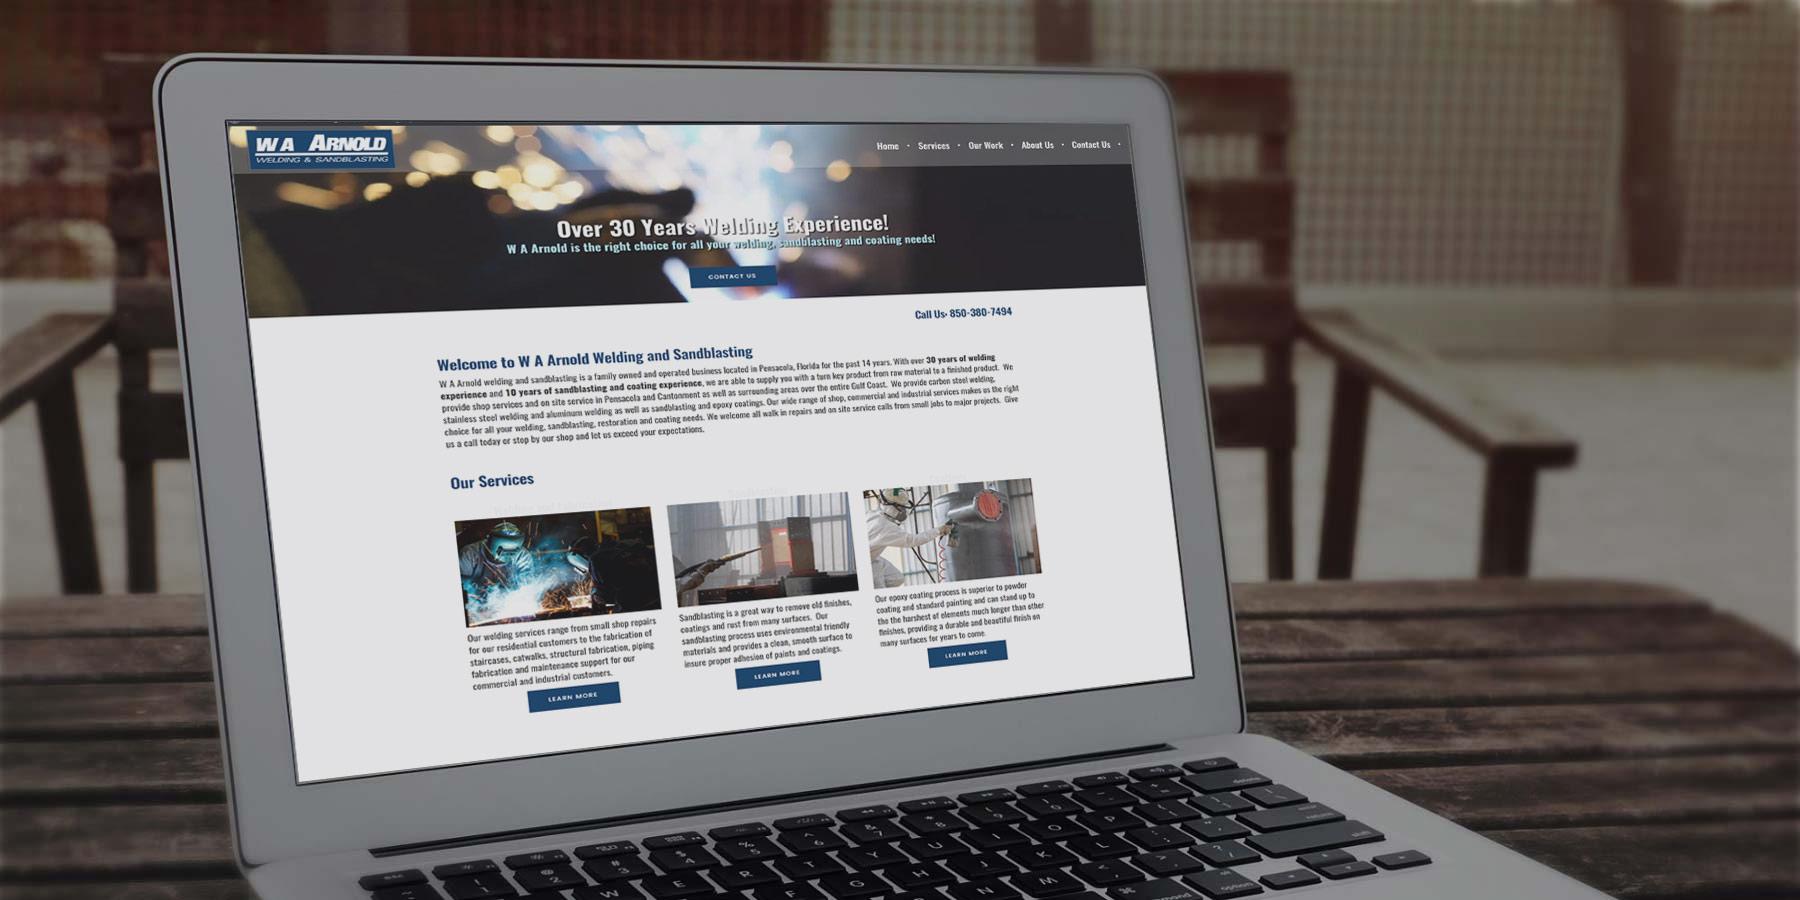 W A Arnold Welding and Sandblasting | Pensacola Web Designs